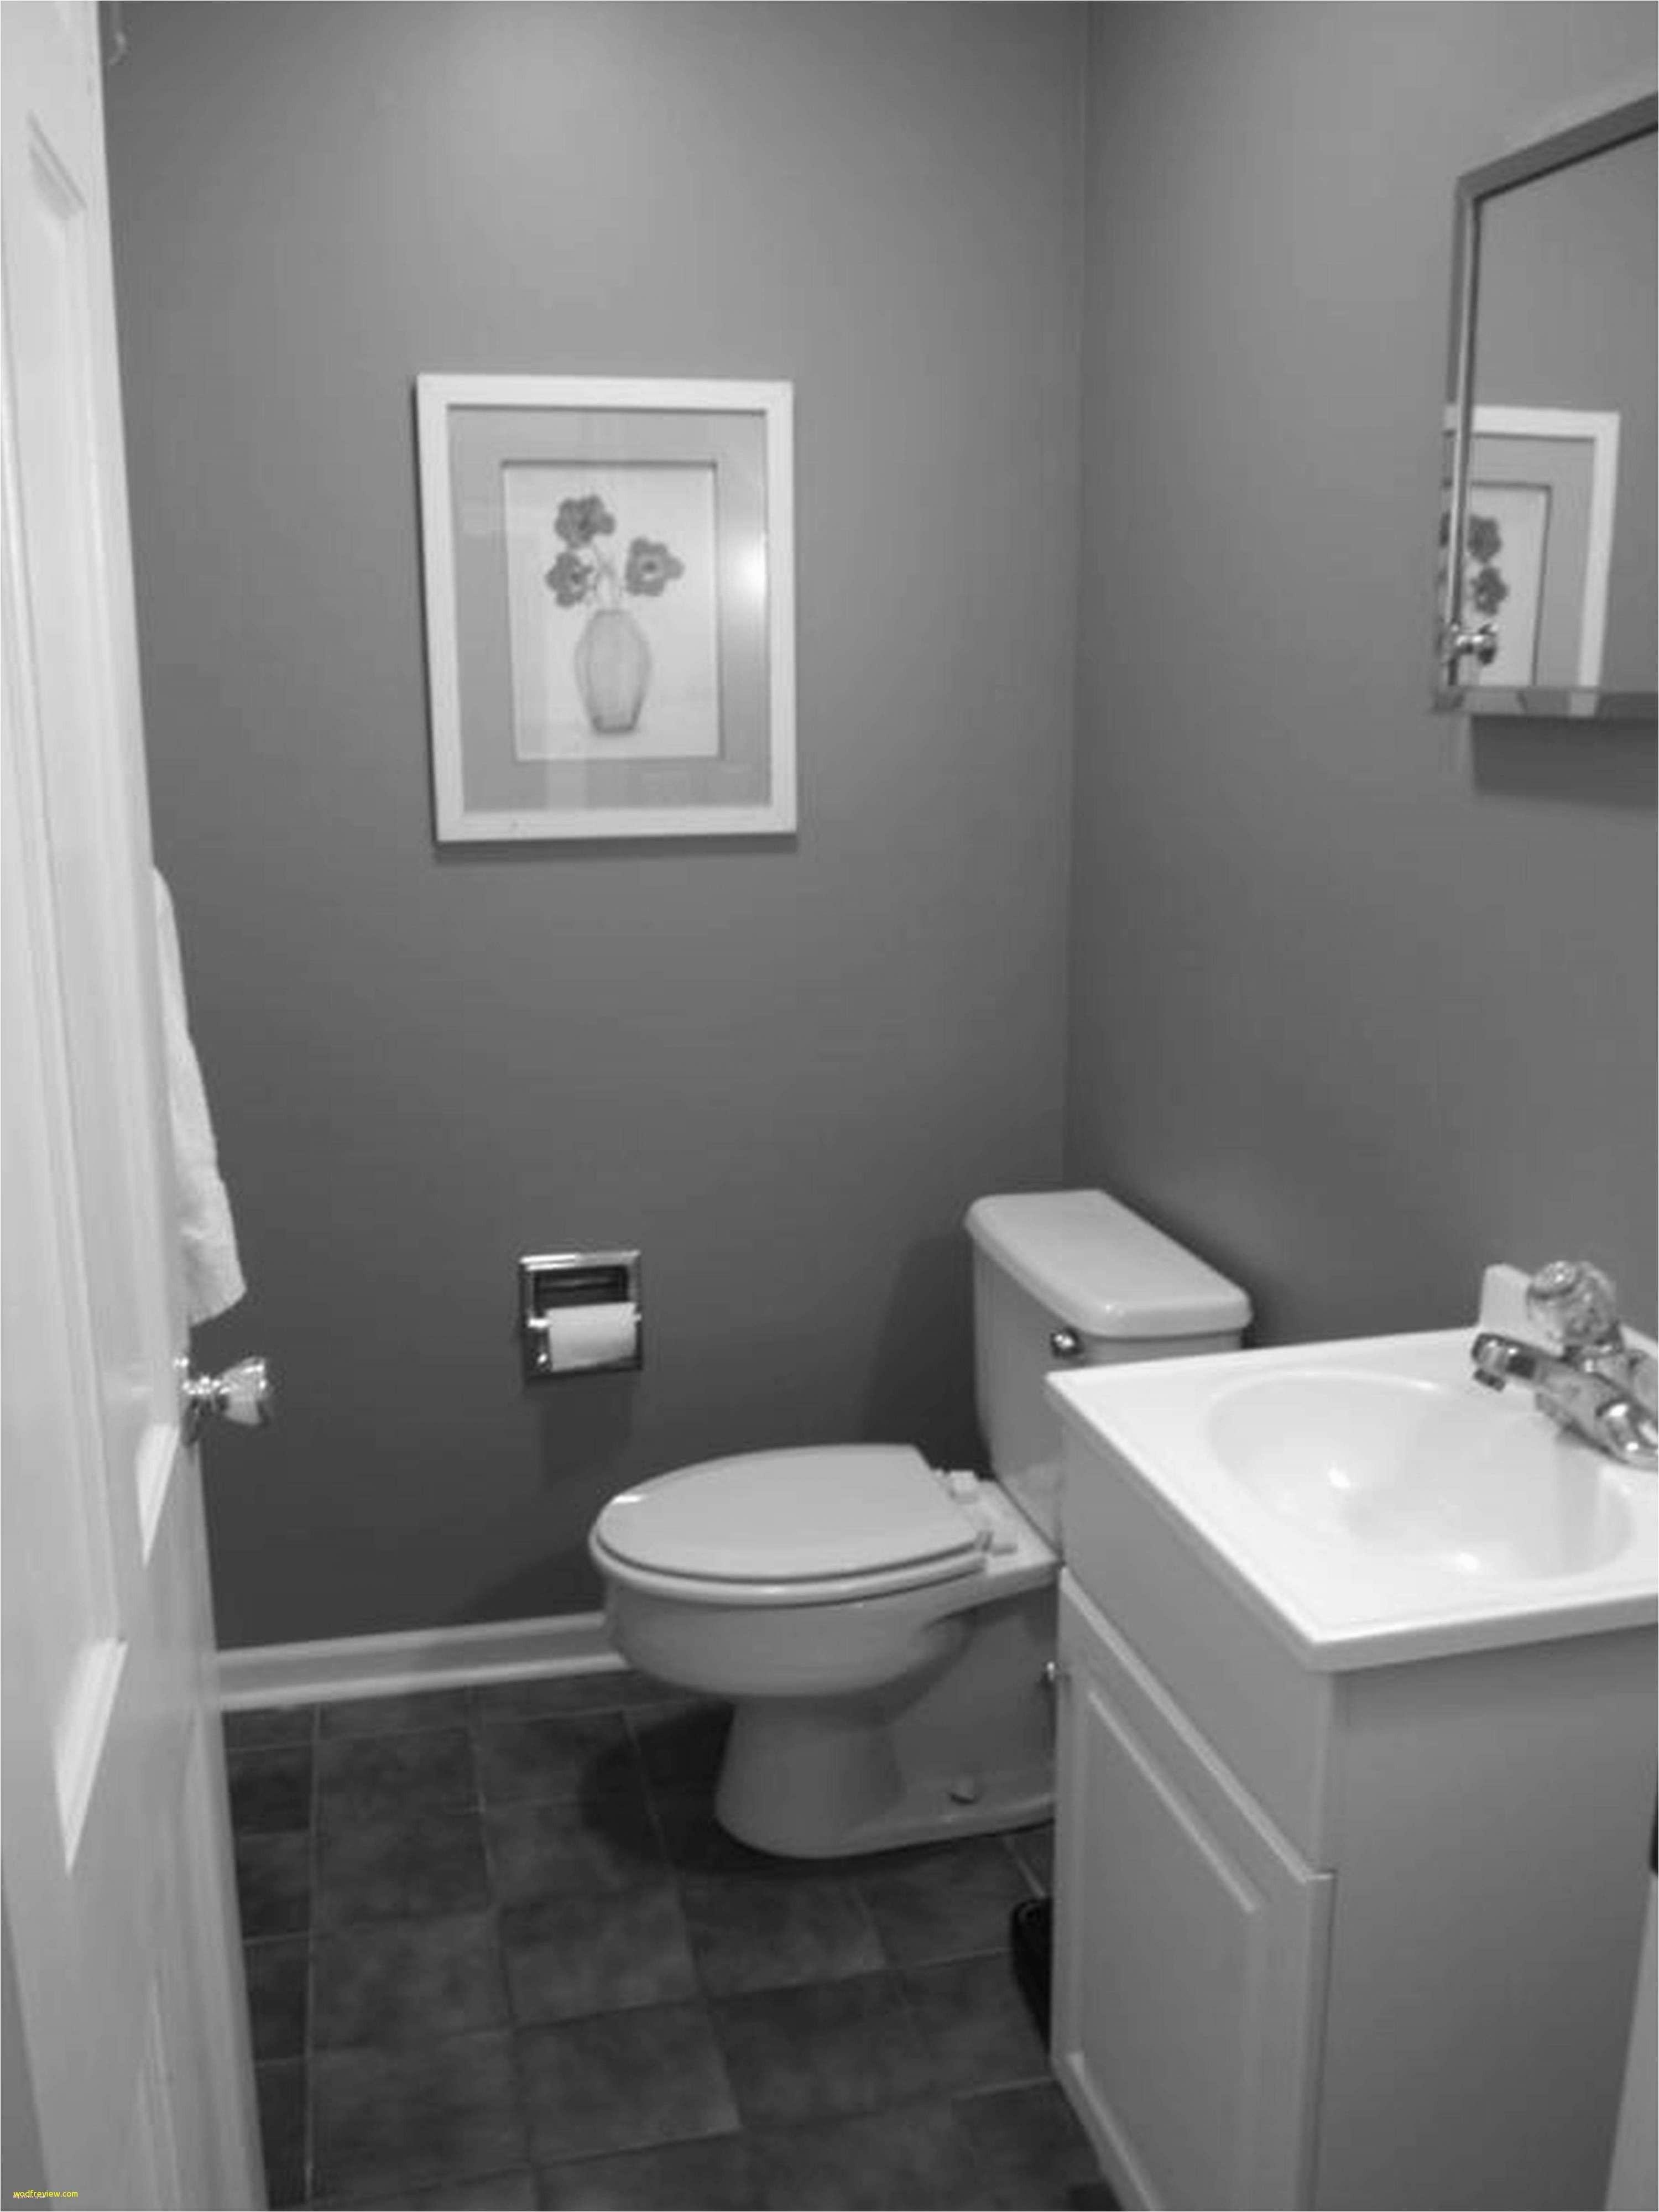 Traditional Bathroom Design Ideas Photos Decorated Small Bathrooms Remarkable White Bathroom Designs Fresh